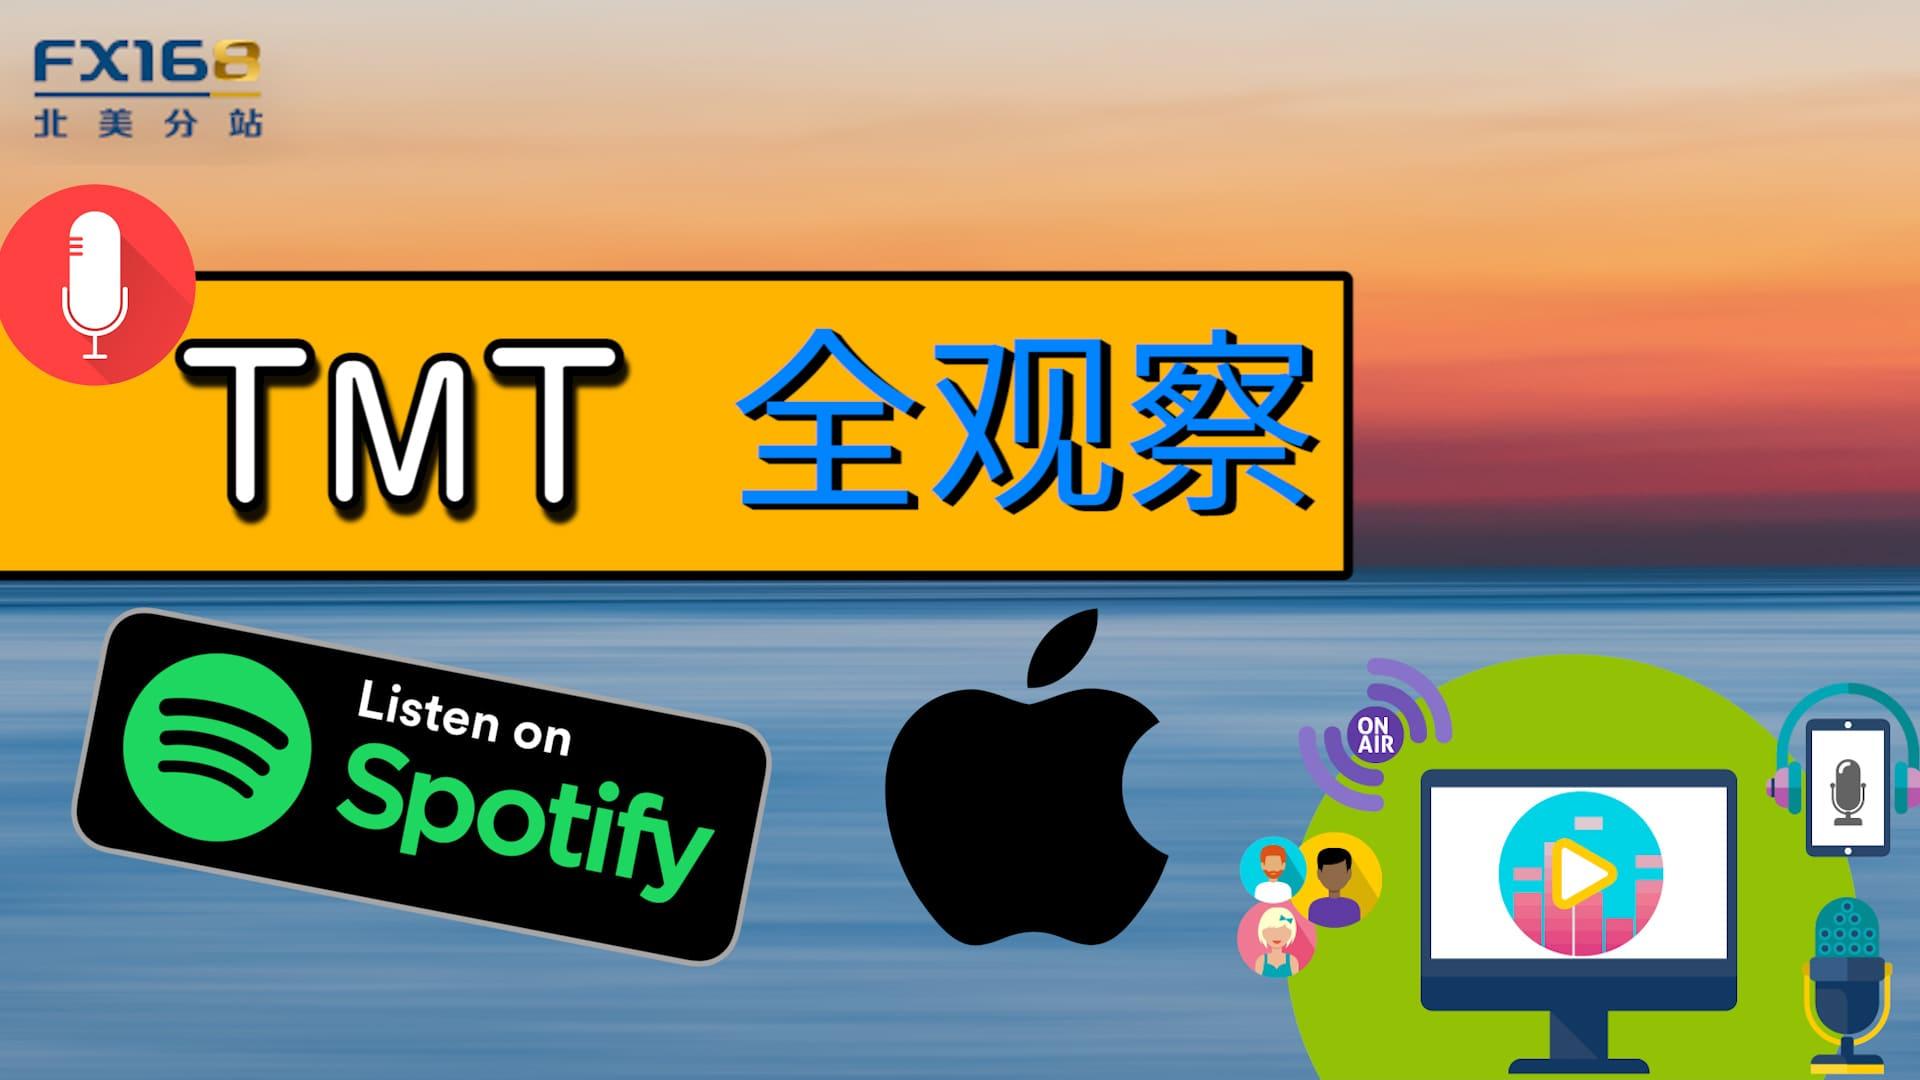 【TMT全观察】从短视频到短音频 苹果、亚马逊、Spotify纷纷下注 播客混战才刚刚打响